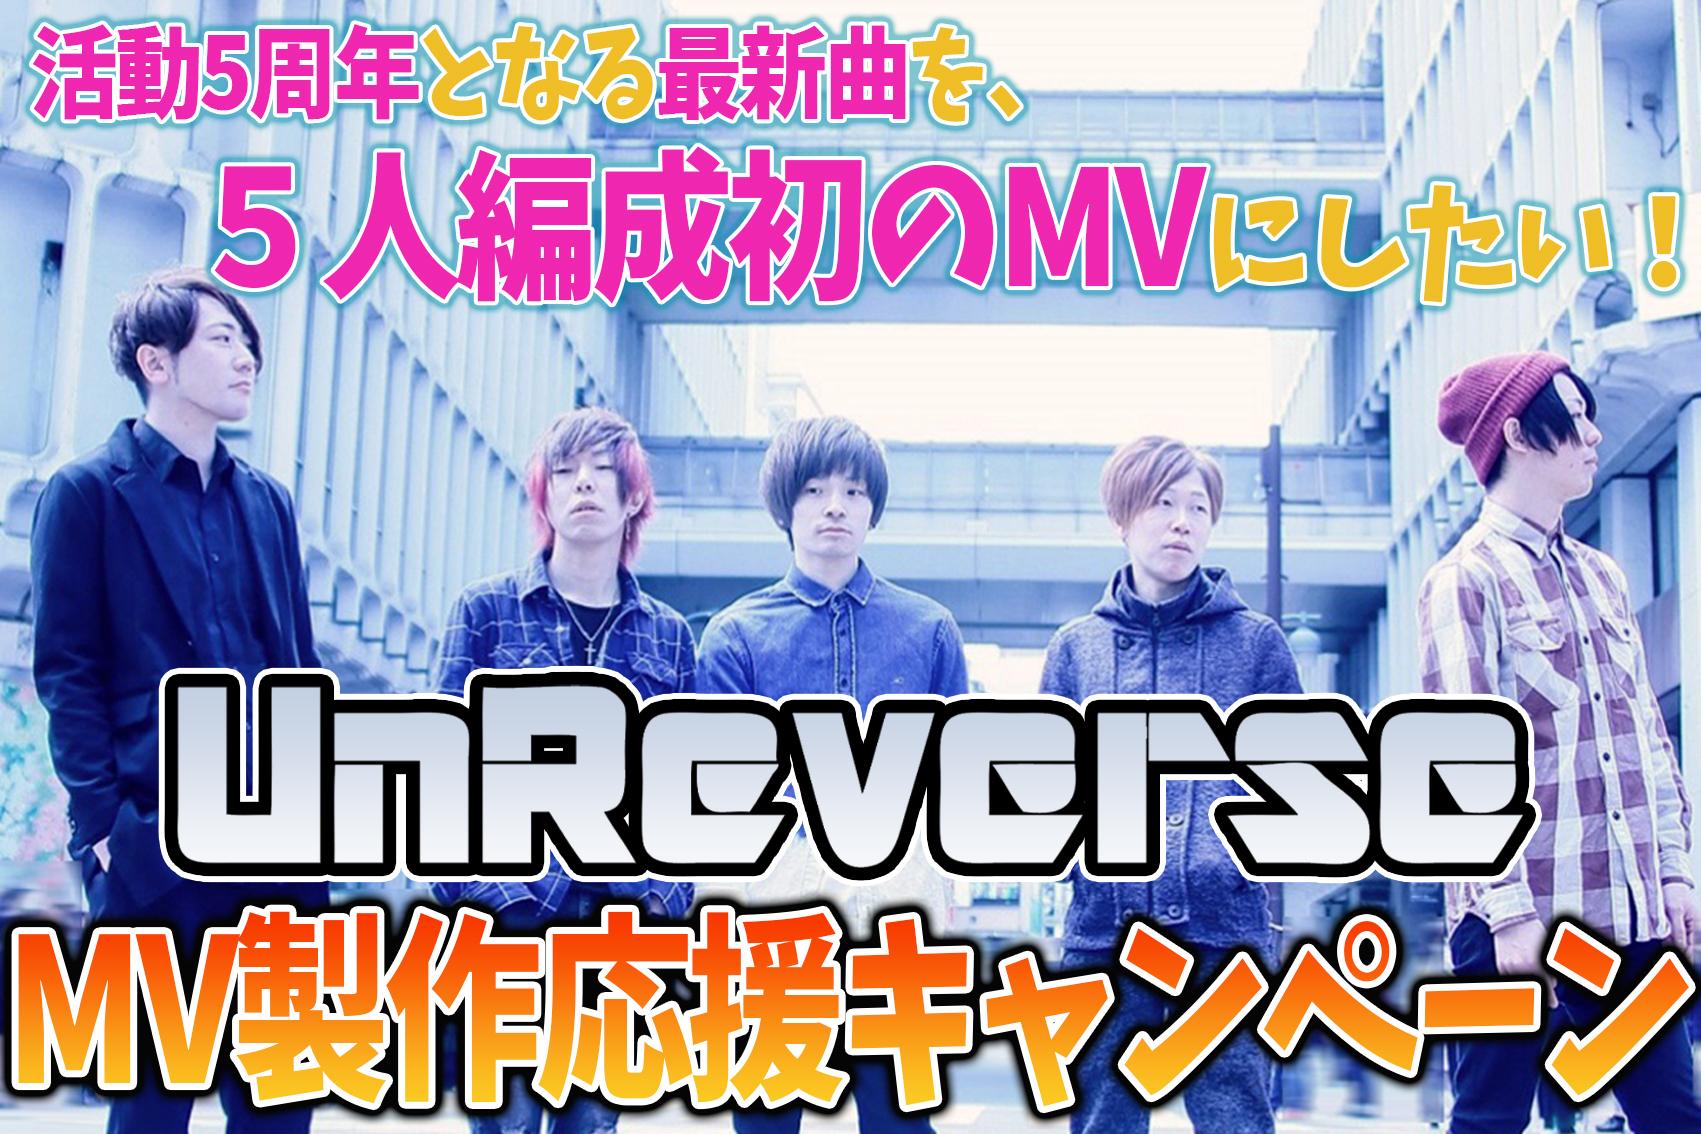 【UnReverse】活動5周年となる最新曲を、5人編成初のMVにしたい!MV製作応援キャンペーン